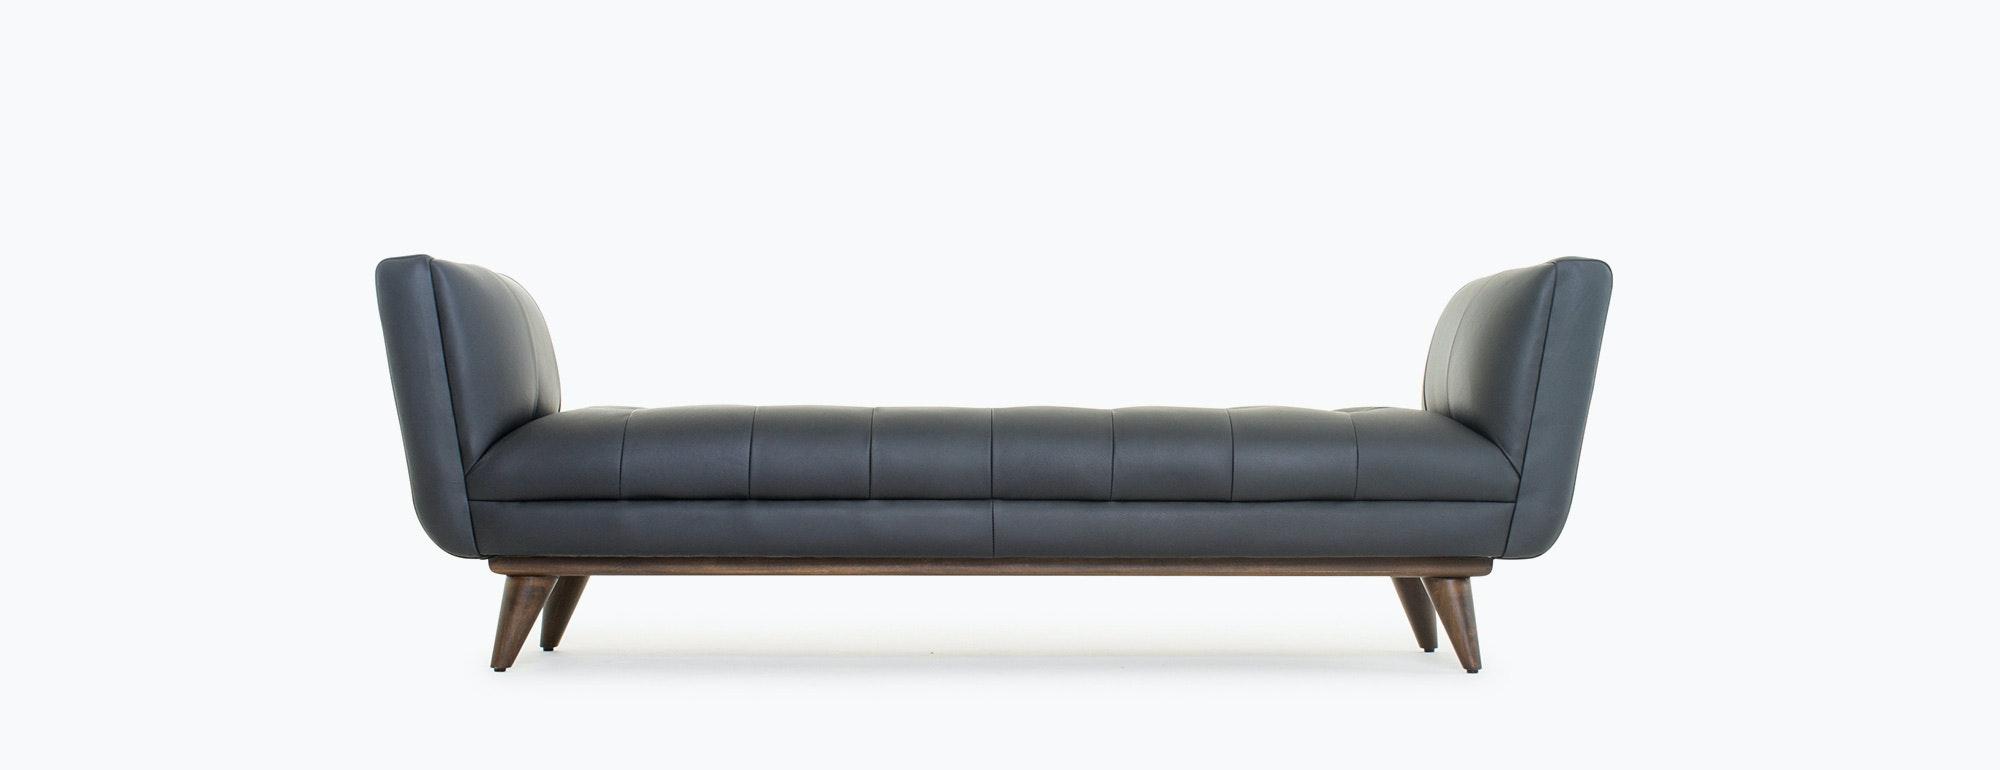 hughes leather bench  joybird - shown in brighton black leather